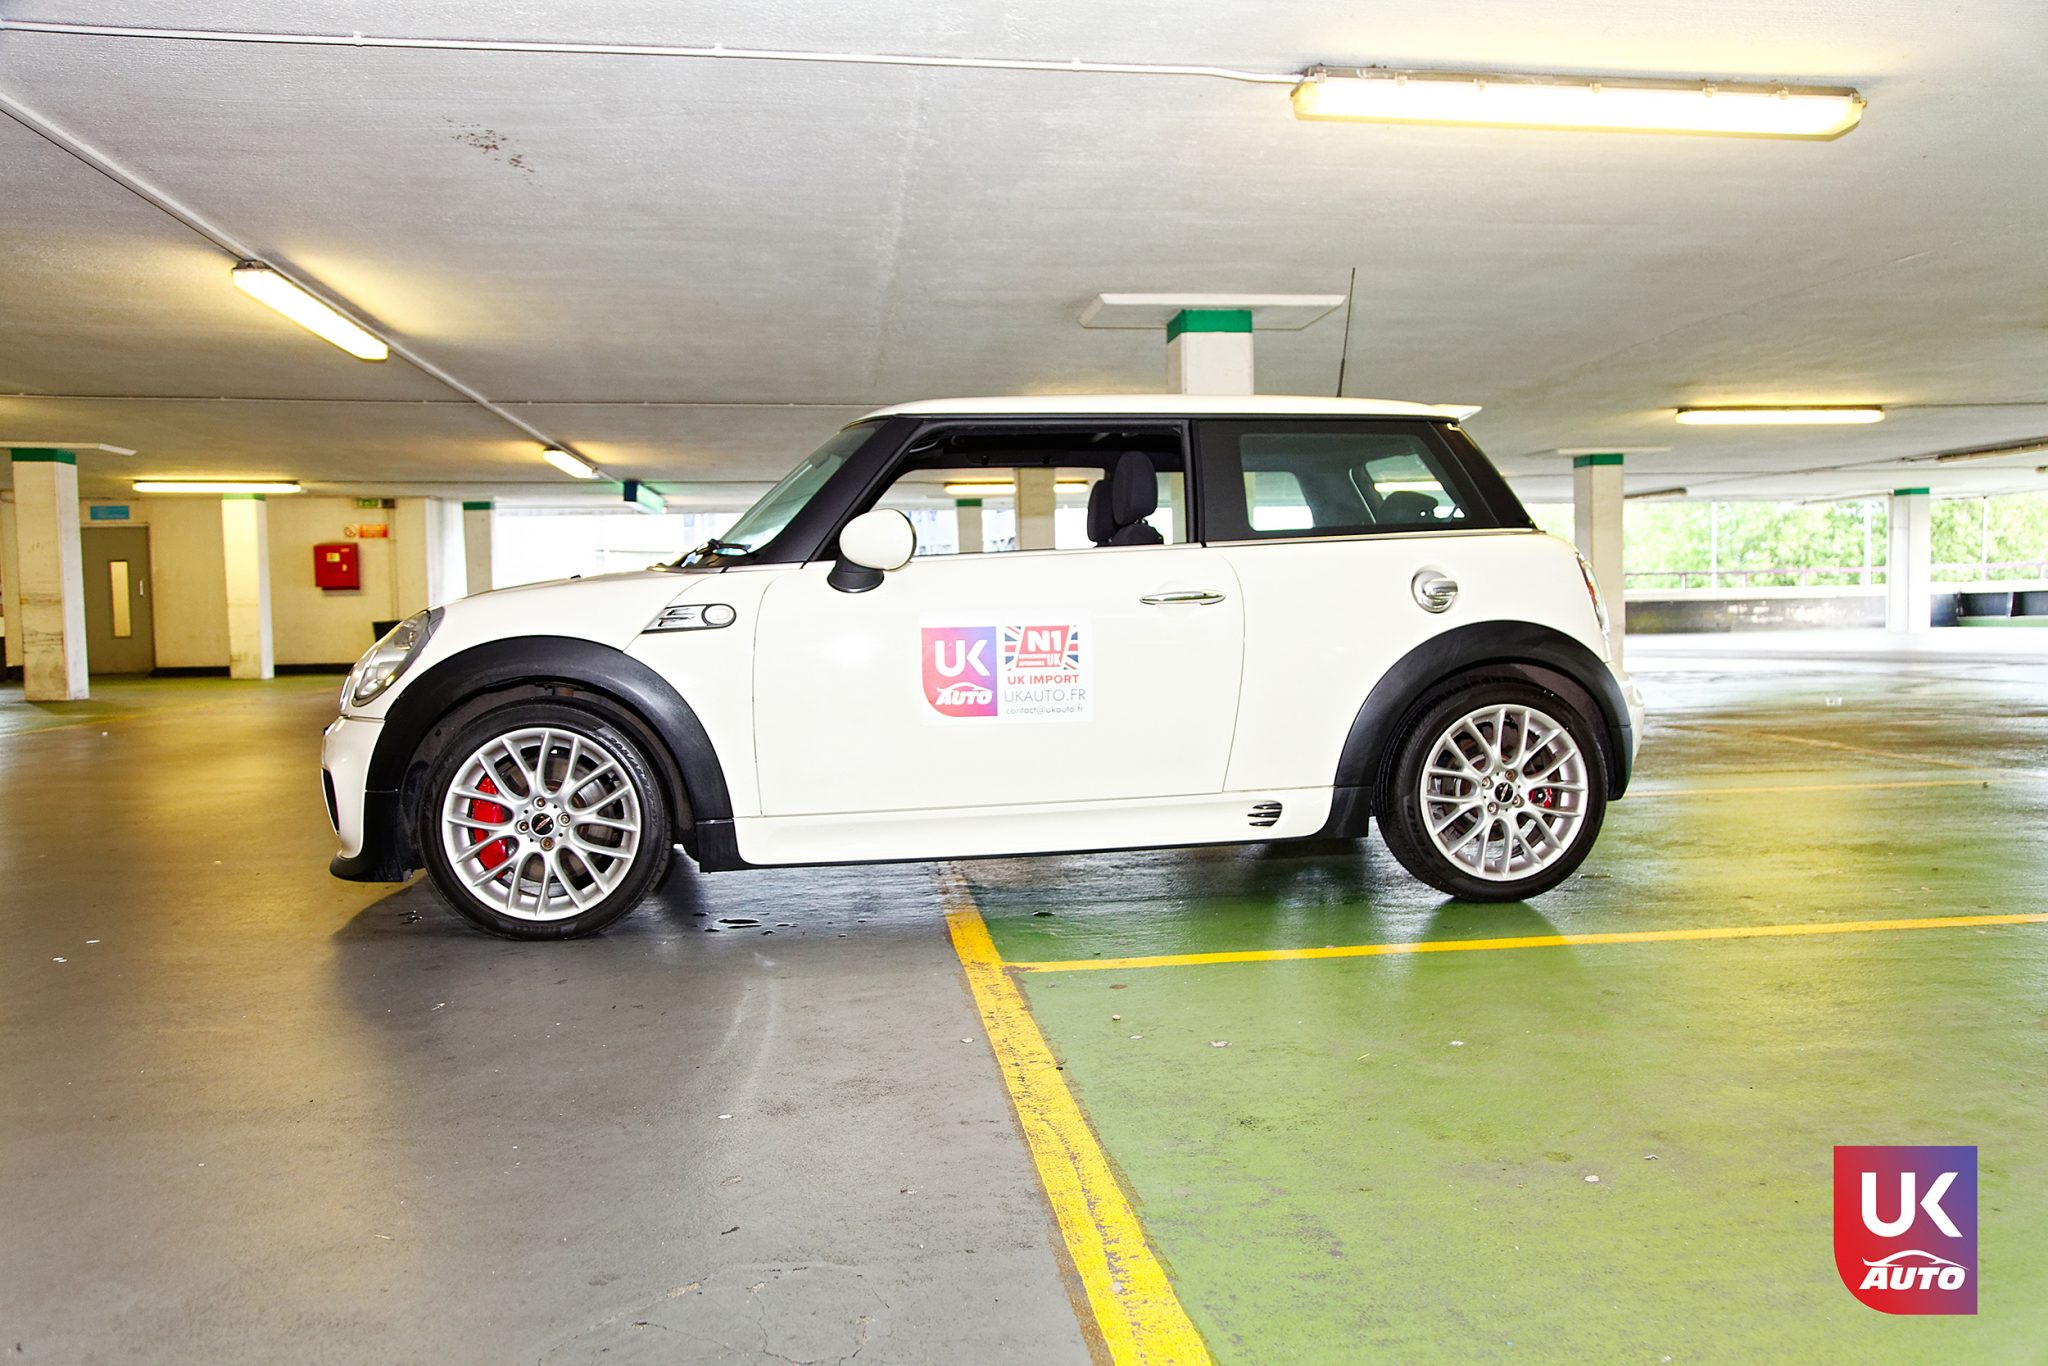 uk mini angleterre mini cooper jcw john cooper works importation angleterre voiture occasion angleterre2 - Felicitation a Antoine Mini Cooper JCW John Cooper Works R56 voiture d'occasion en Angleterre